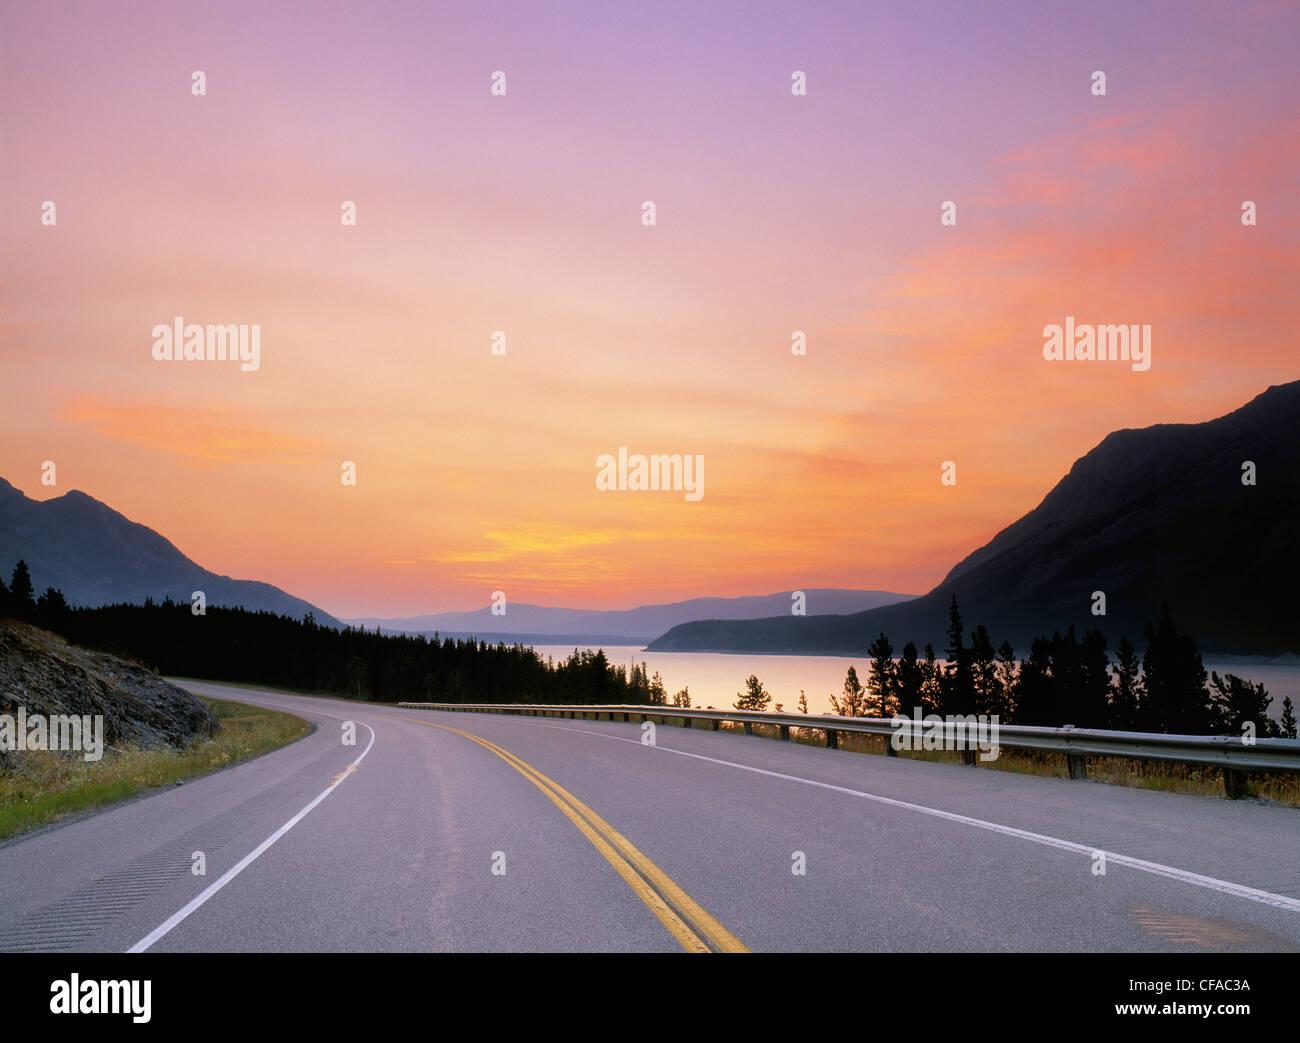 Highway 11 near Lake Abraham, Alberta, Canada. - Stock Image